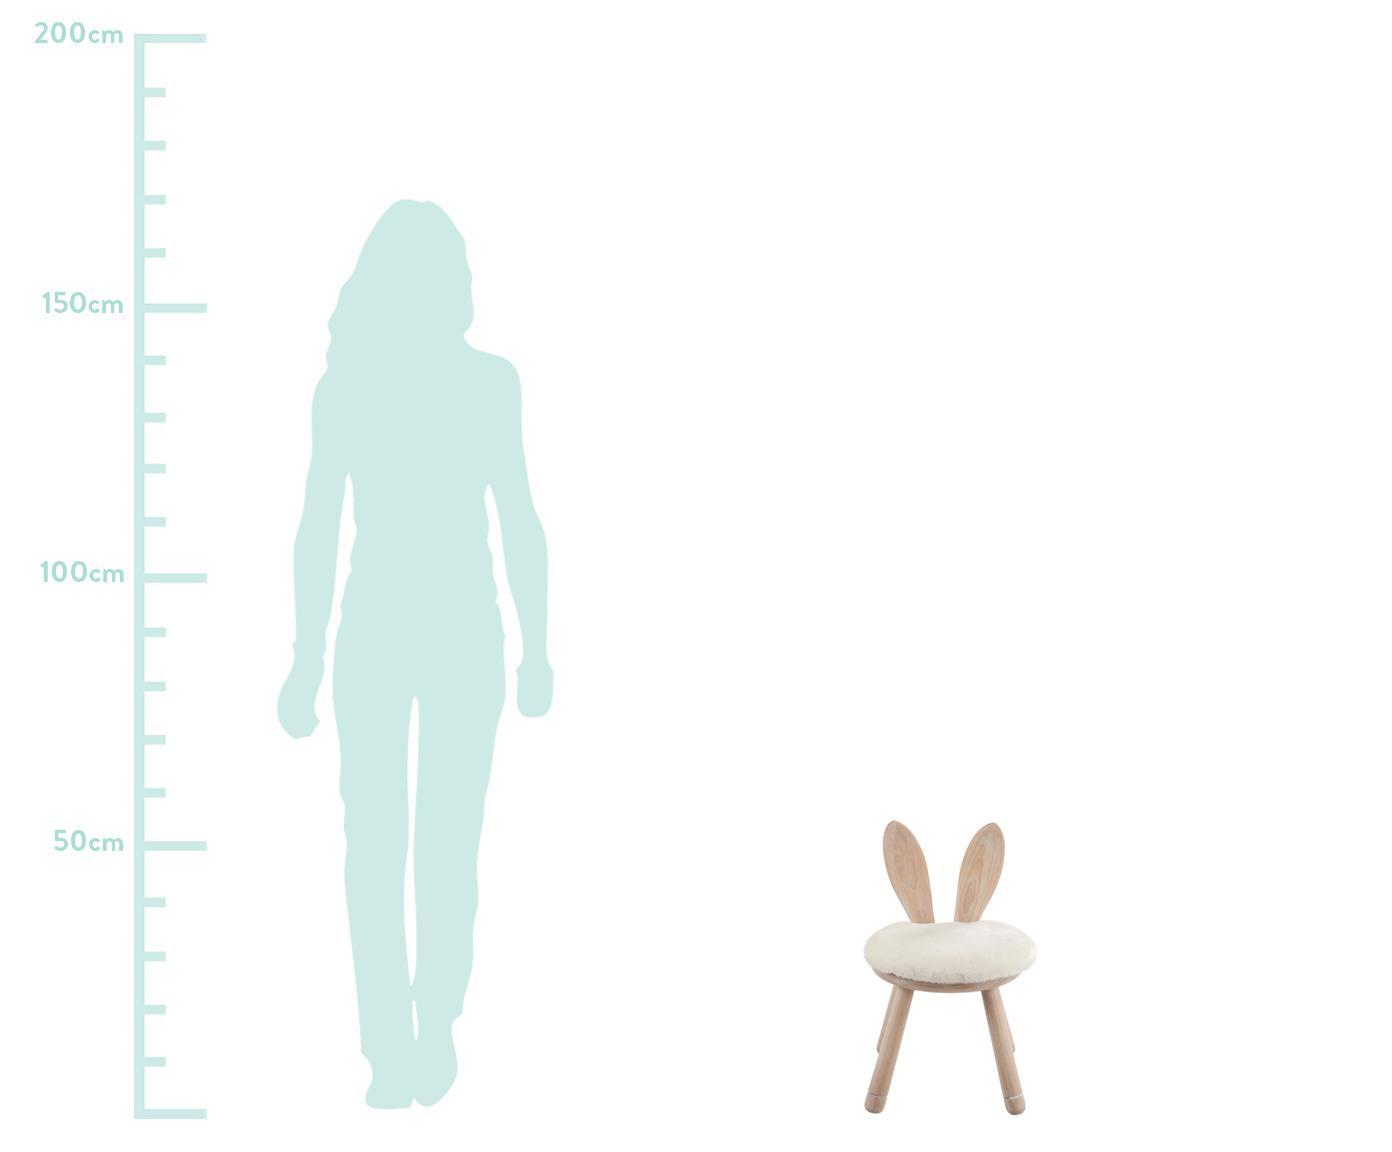 Kinderstuhl Bunny, Sitzkissen: Baumwolle, Gummiholz, Creme, 34 x 55 cm